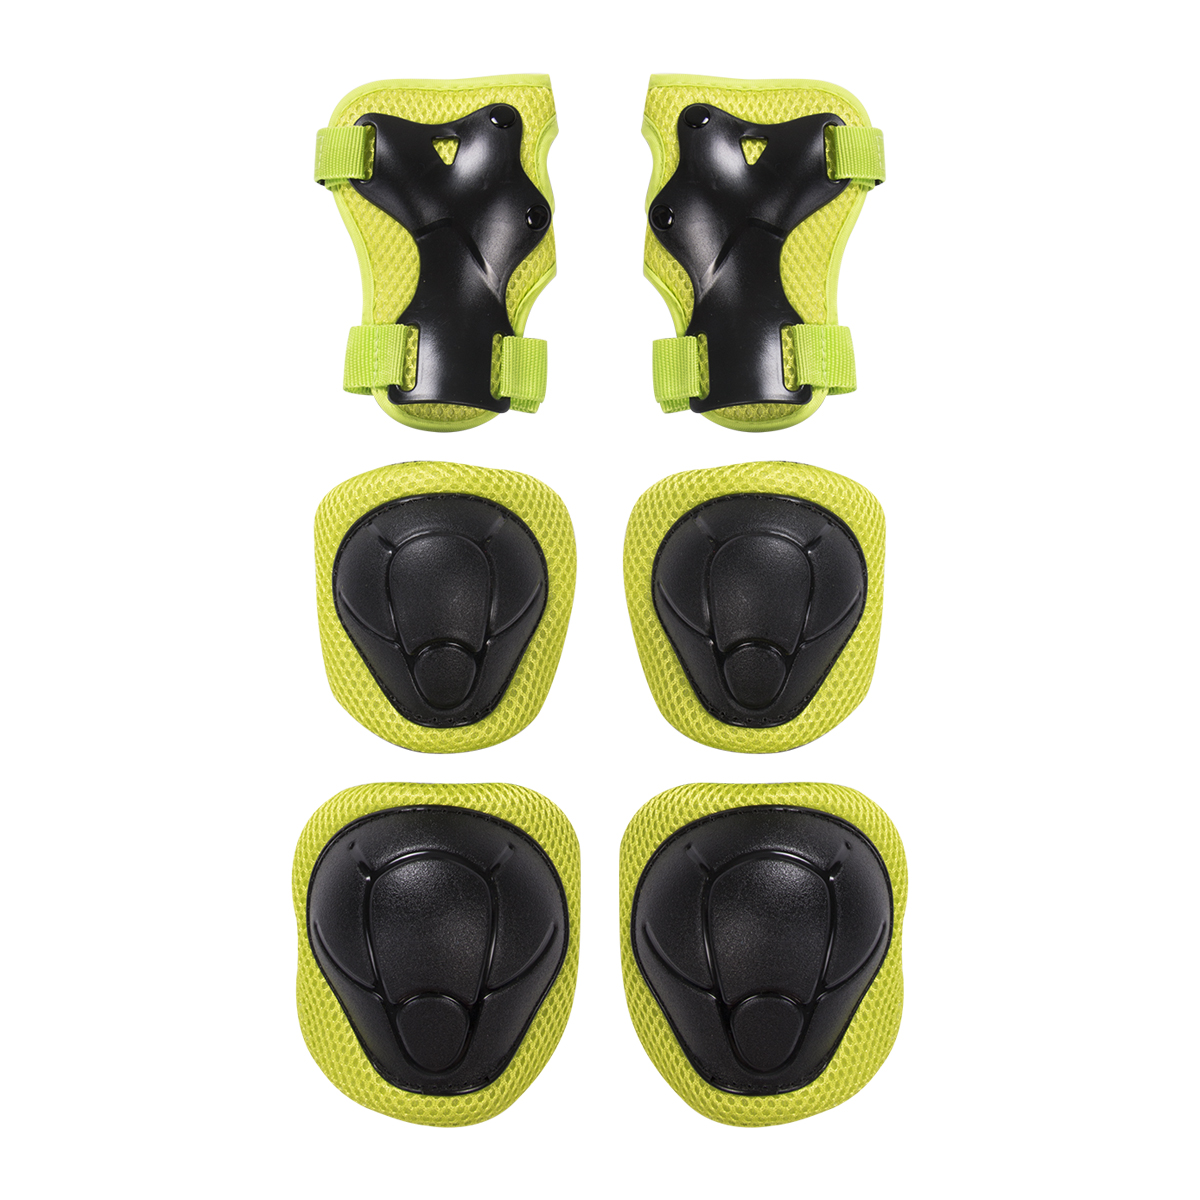 Gear Handguard Elbow pads Kneepads kids Rollerblade Skating SetElbow